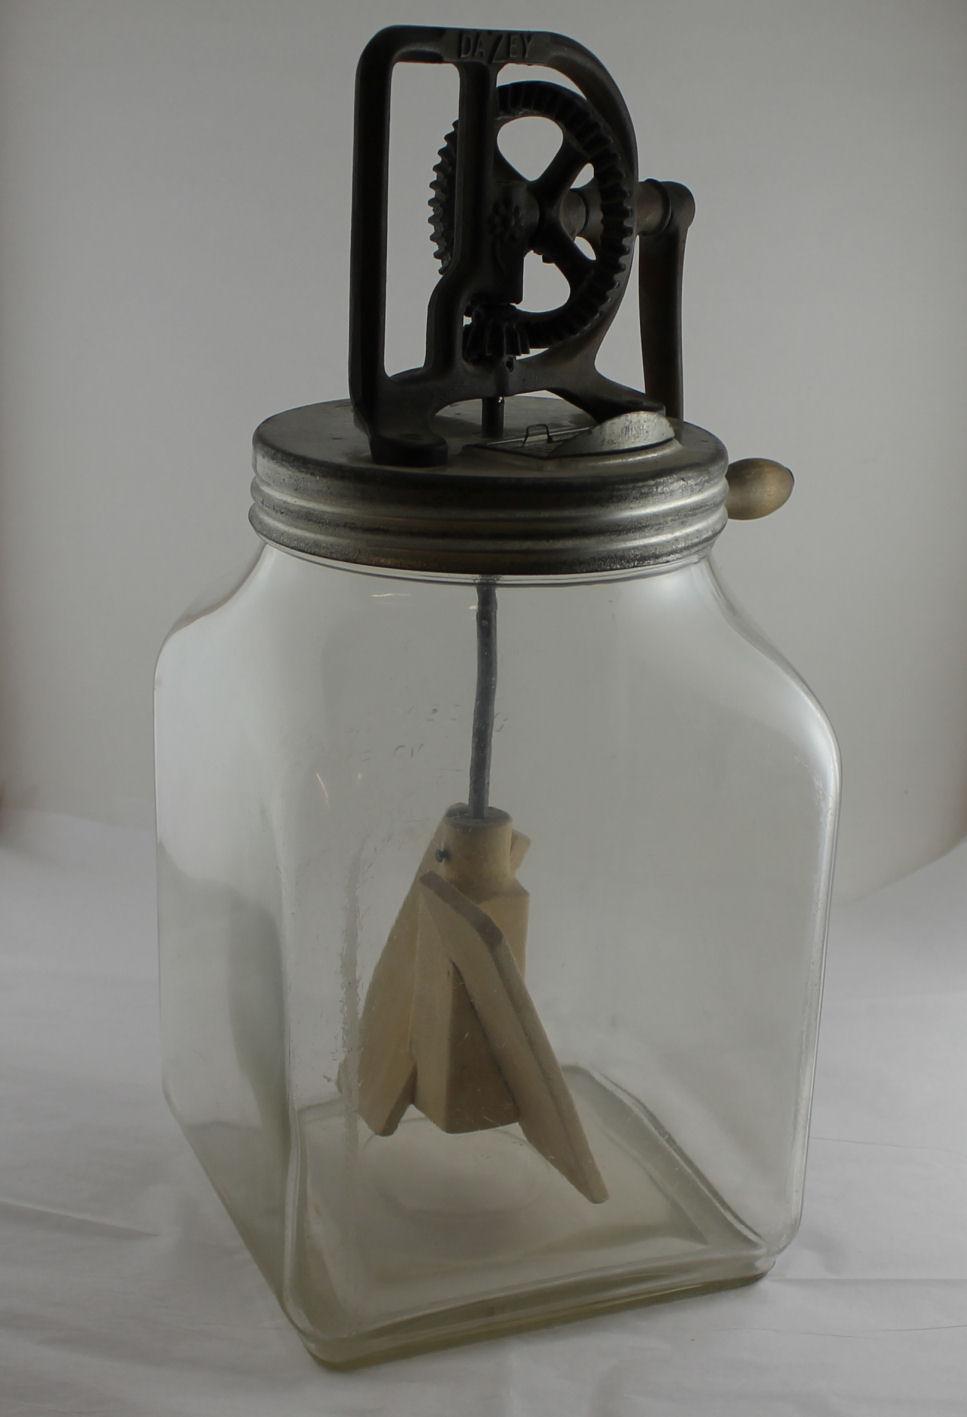 Bargain John S Antiques Antique Dazey Glass Butter Churn